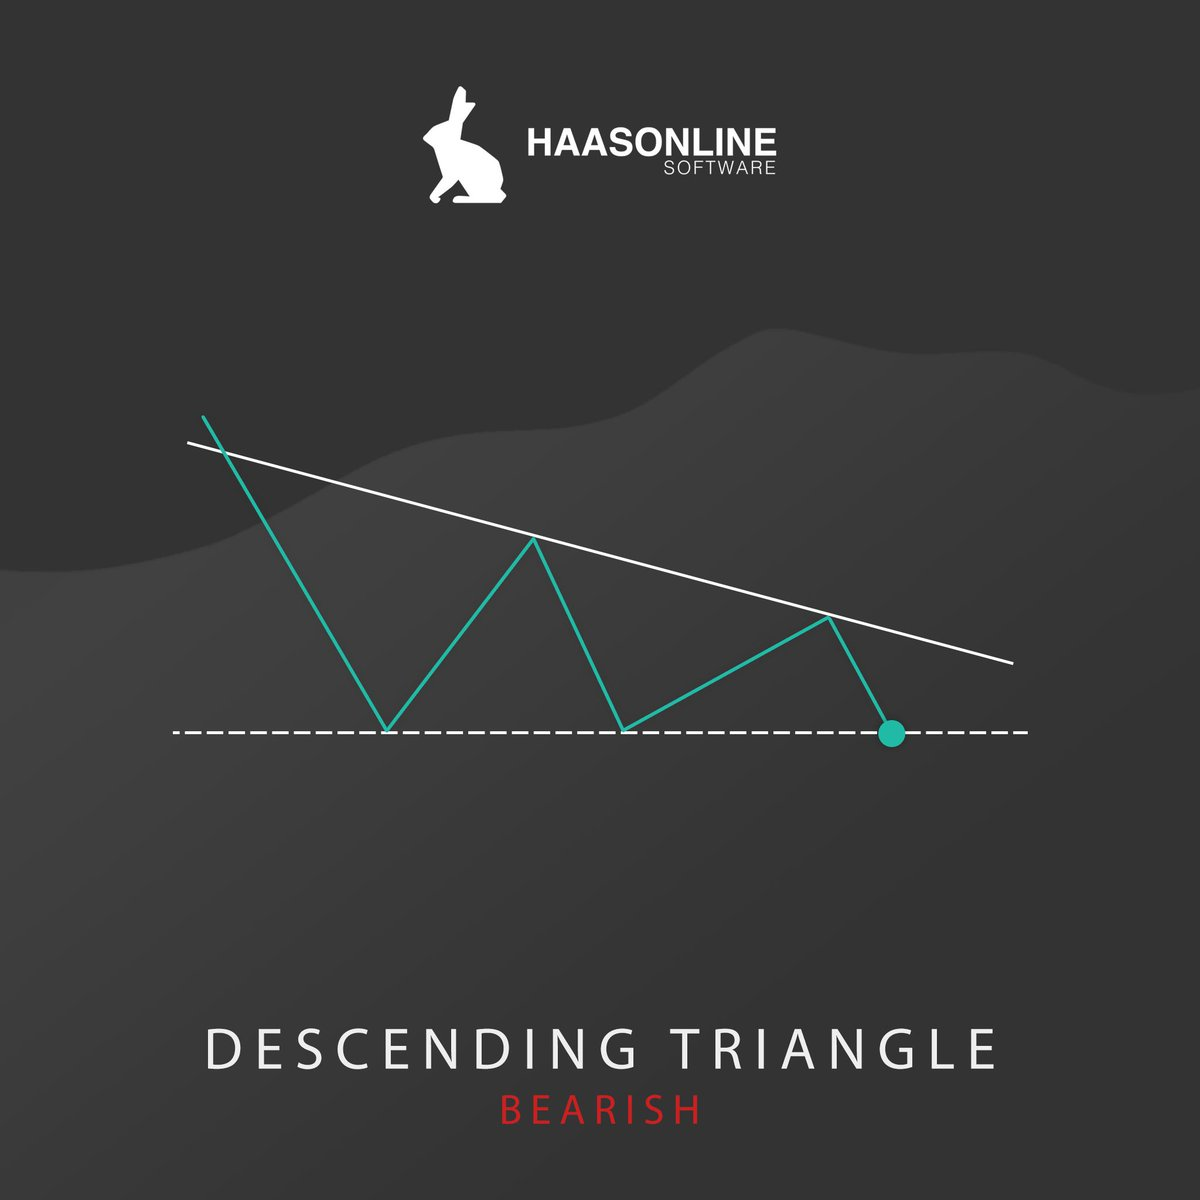 haasonline software